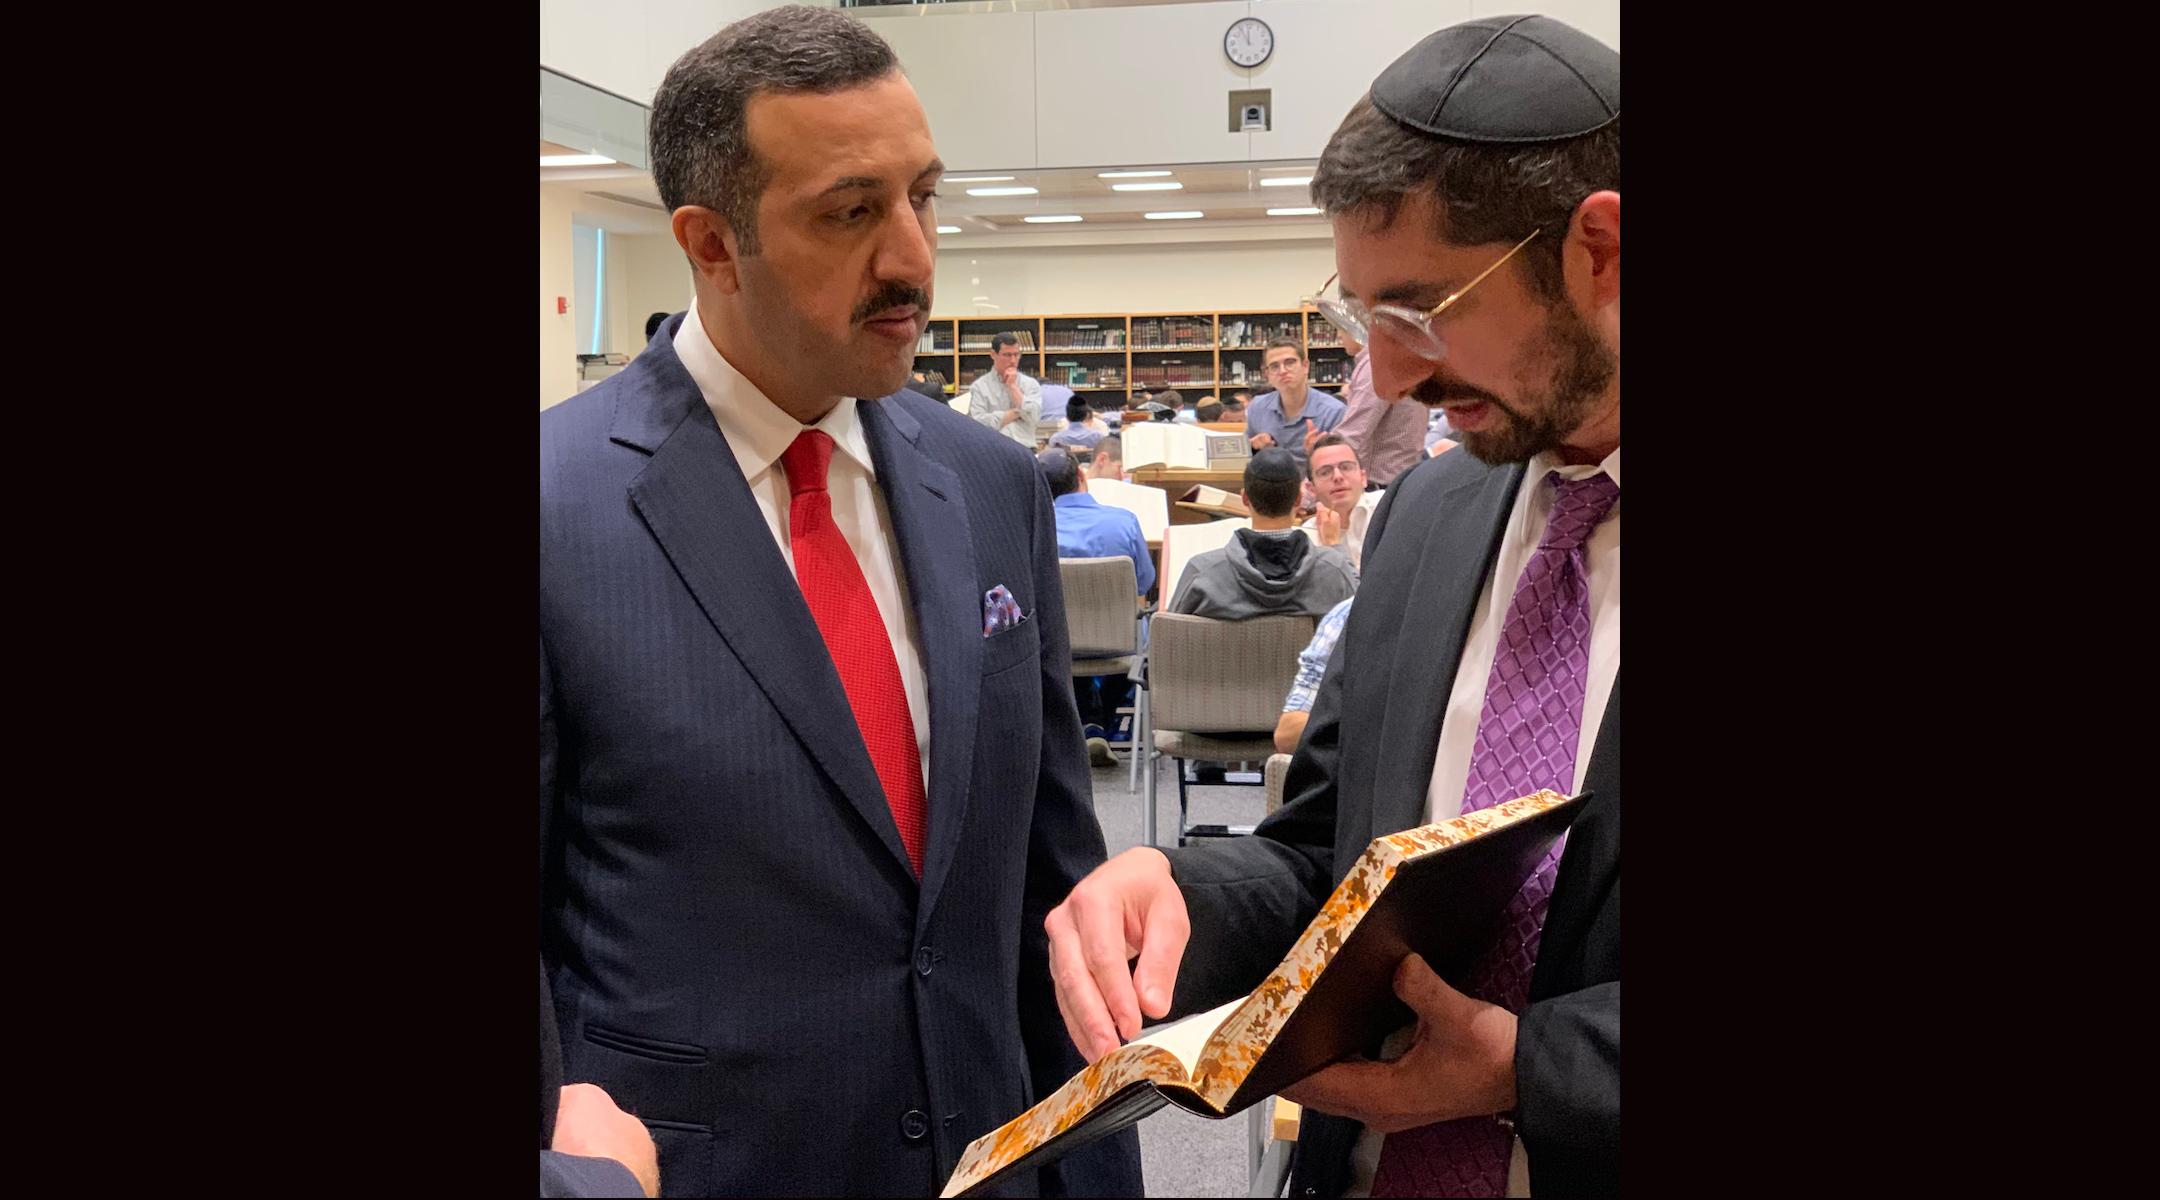 Shaikh Abdulla bin Ahmed Al Khalifa meets with Rabbi Yosef Kalinsky, a Yeshiva University dean.